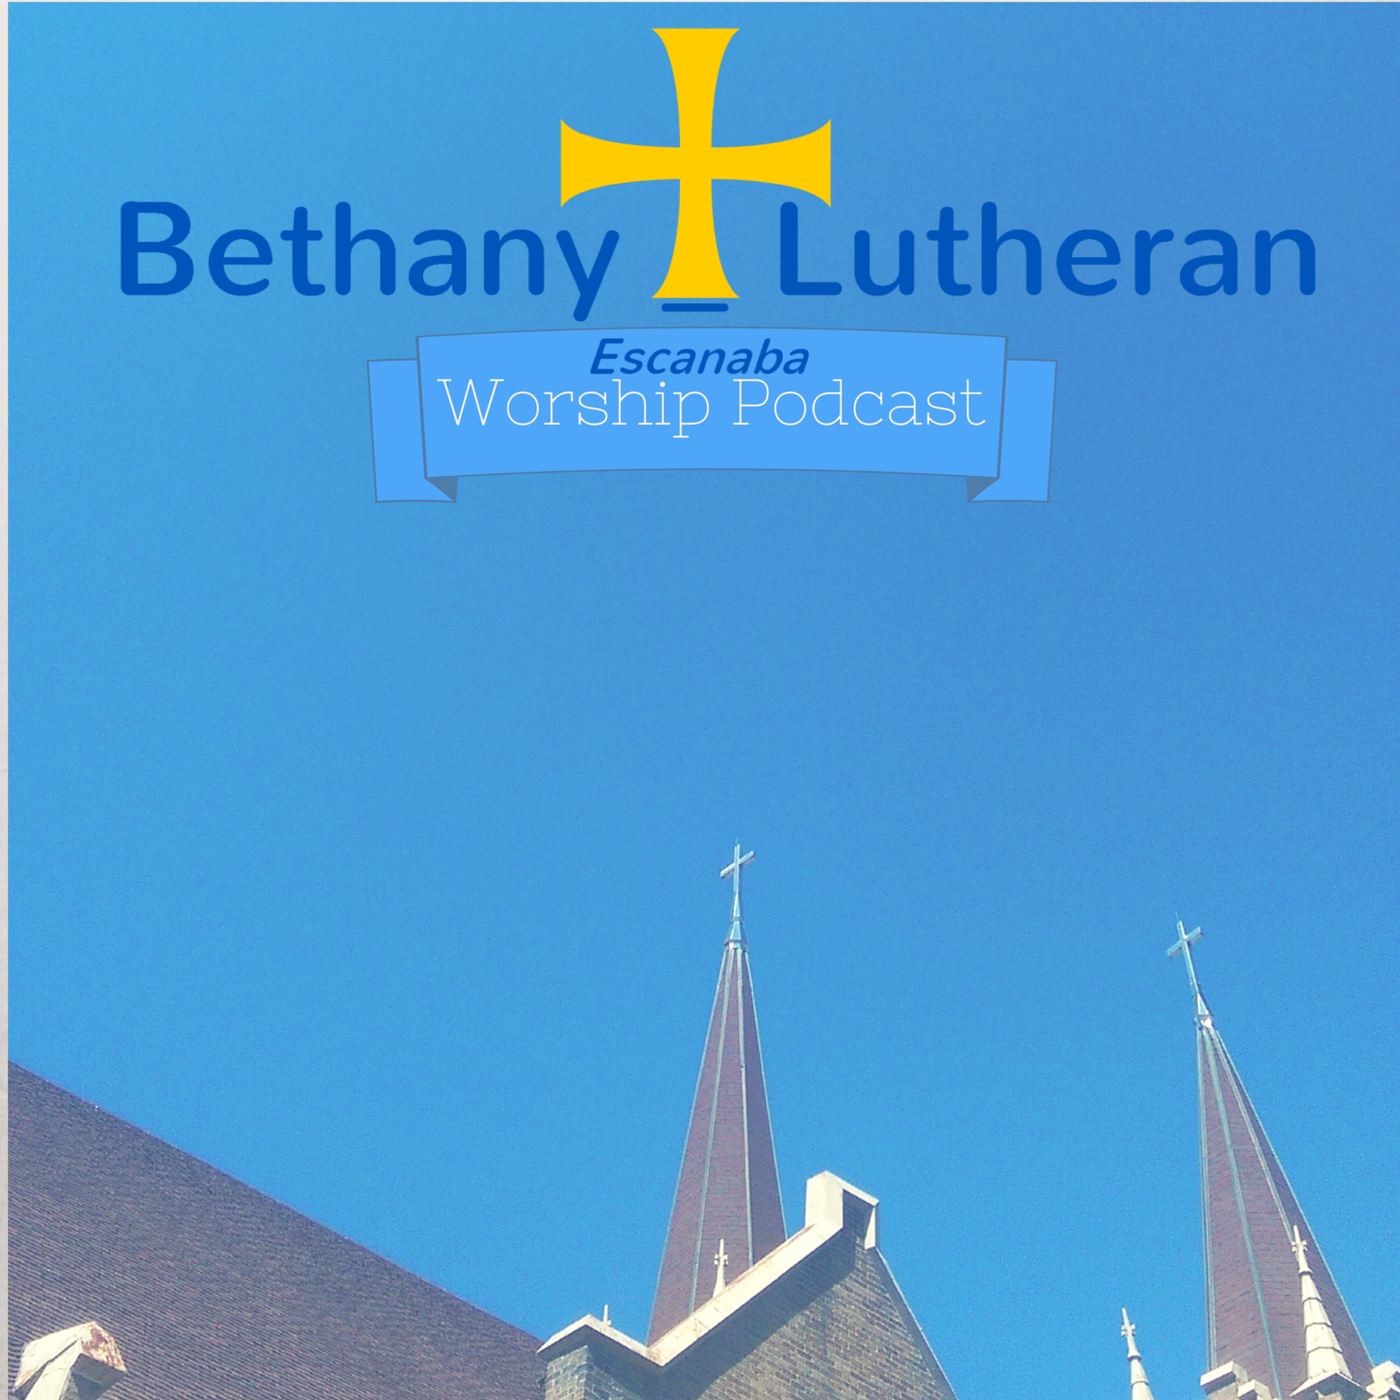 Bethany Lutheran Escanaba Worship